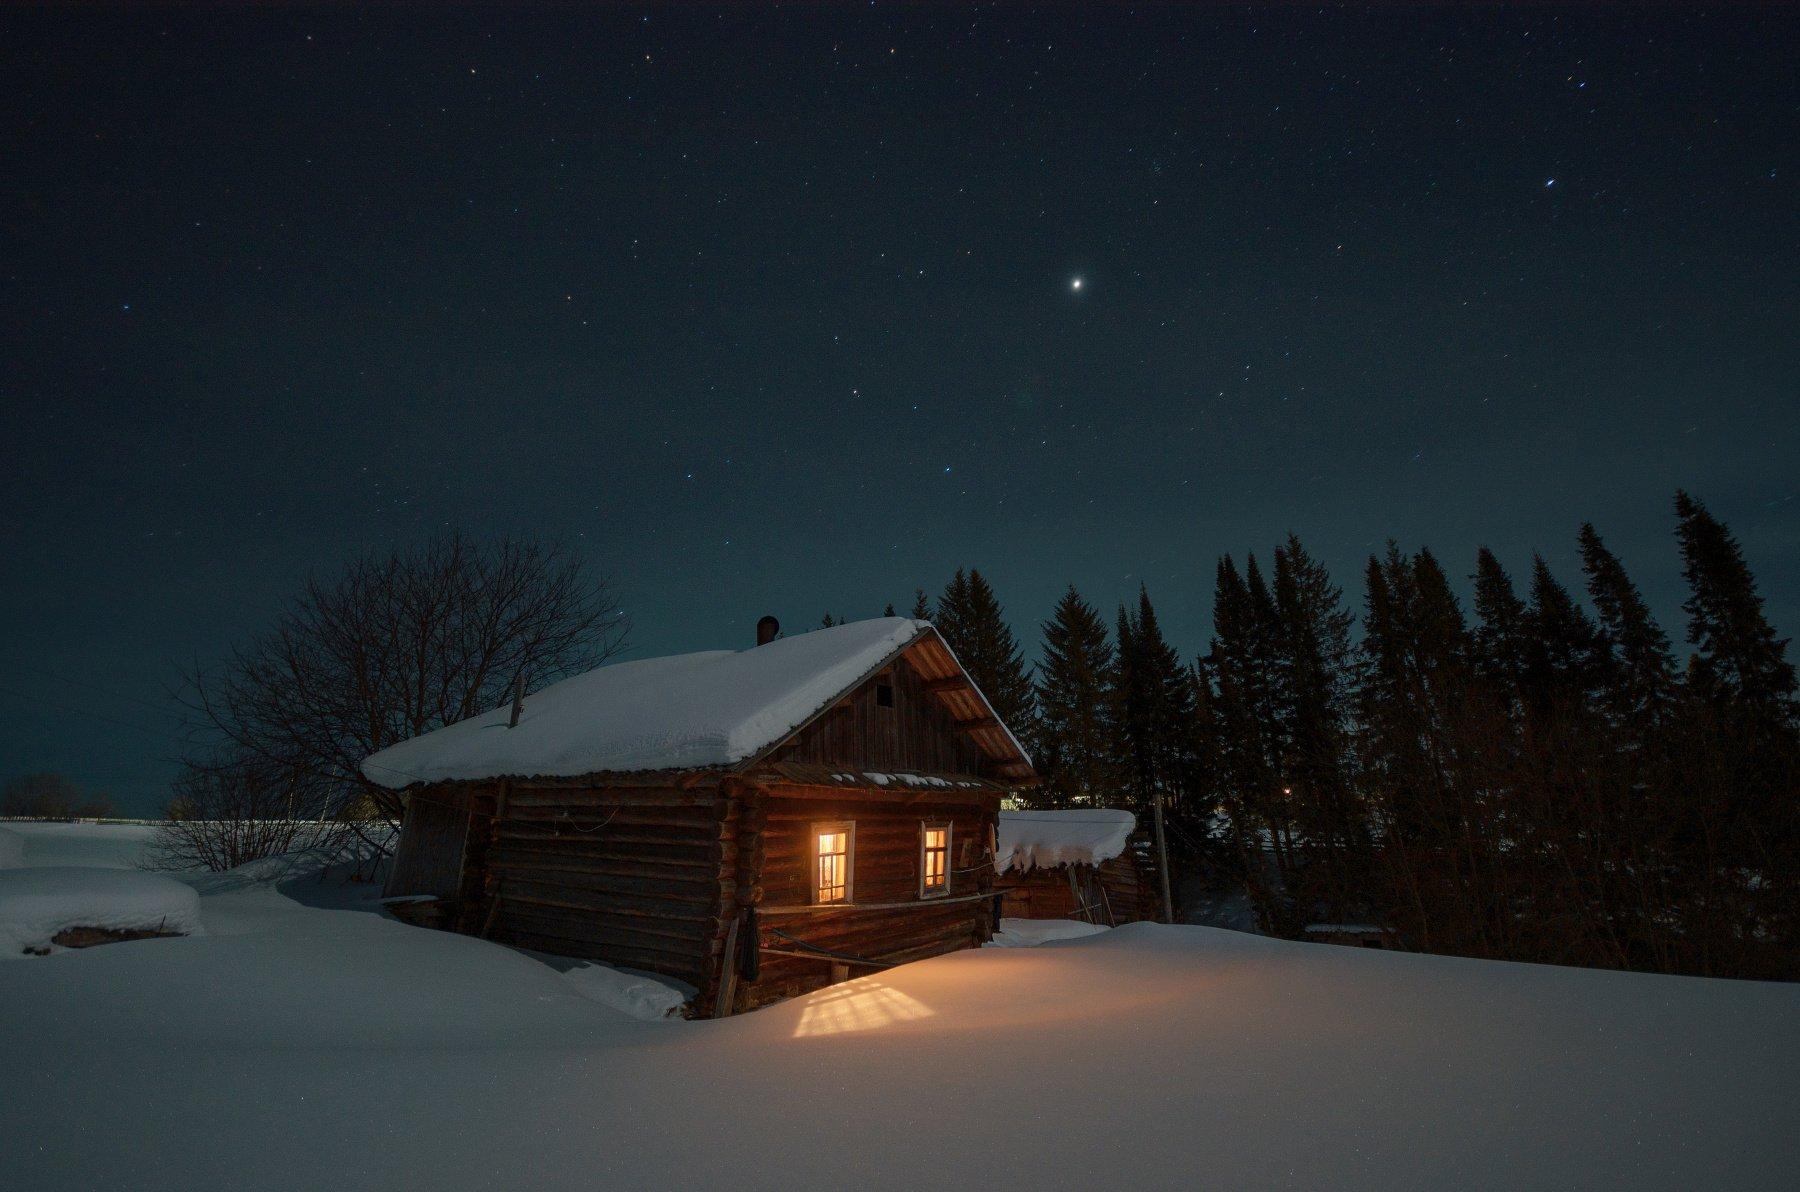 Деревня, Звезды, Изба, Луна, Снег, Сергей